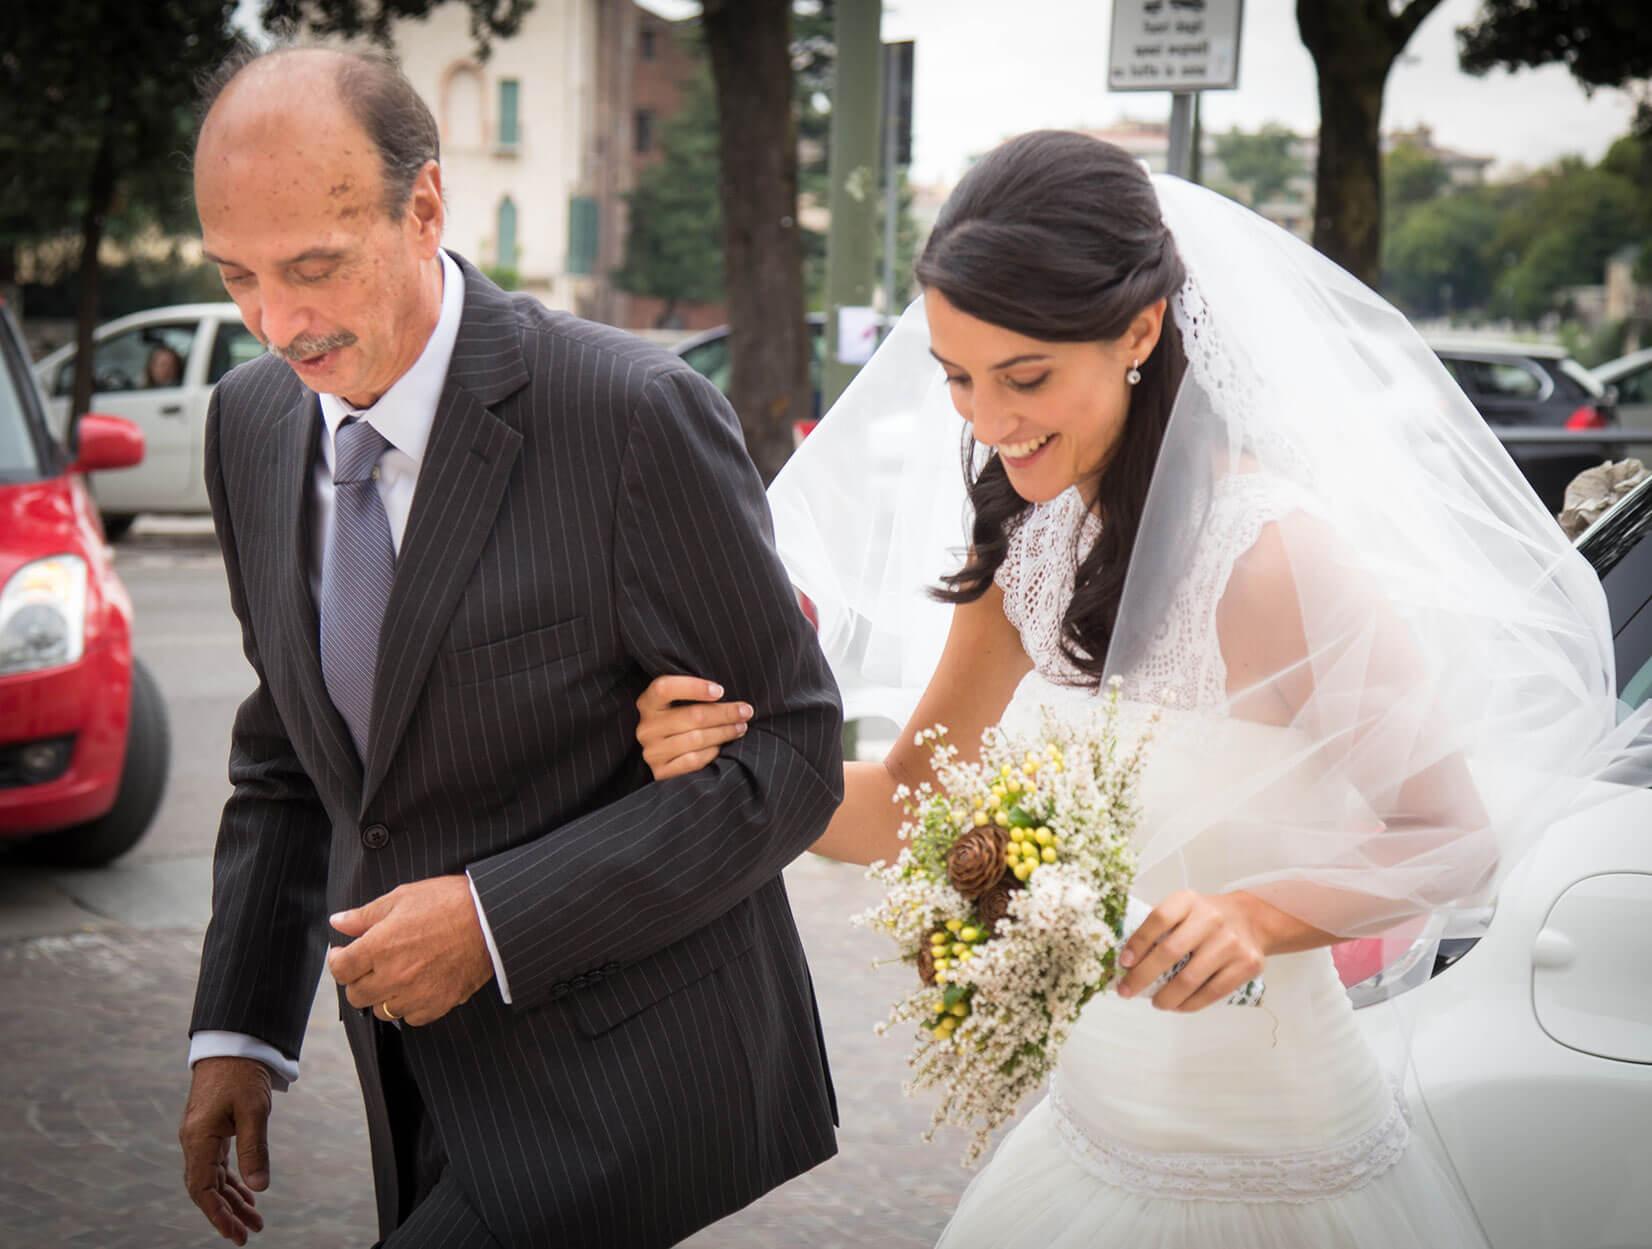 Francesca-Ferrati-wedding-photographer-Verona-Elena-Tommaso7